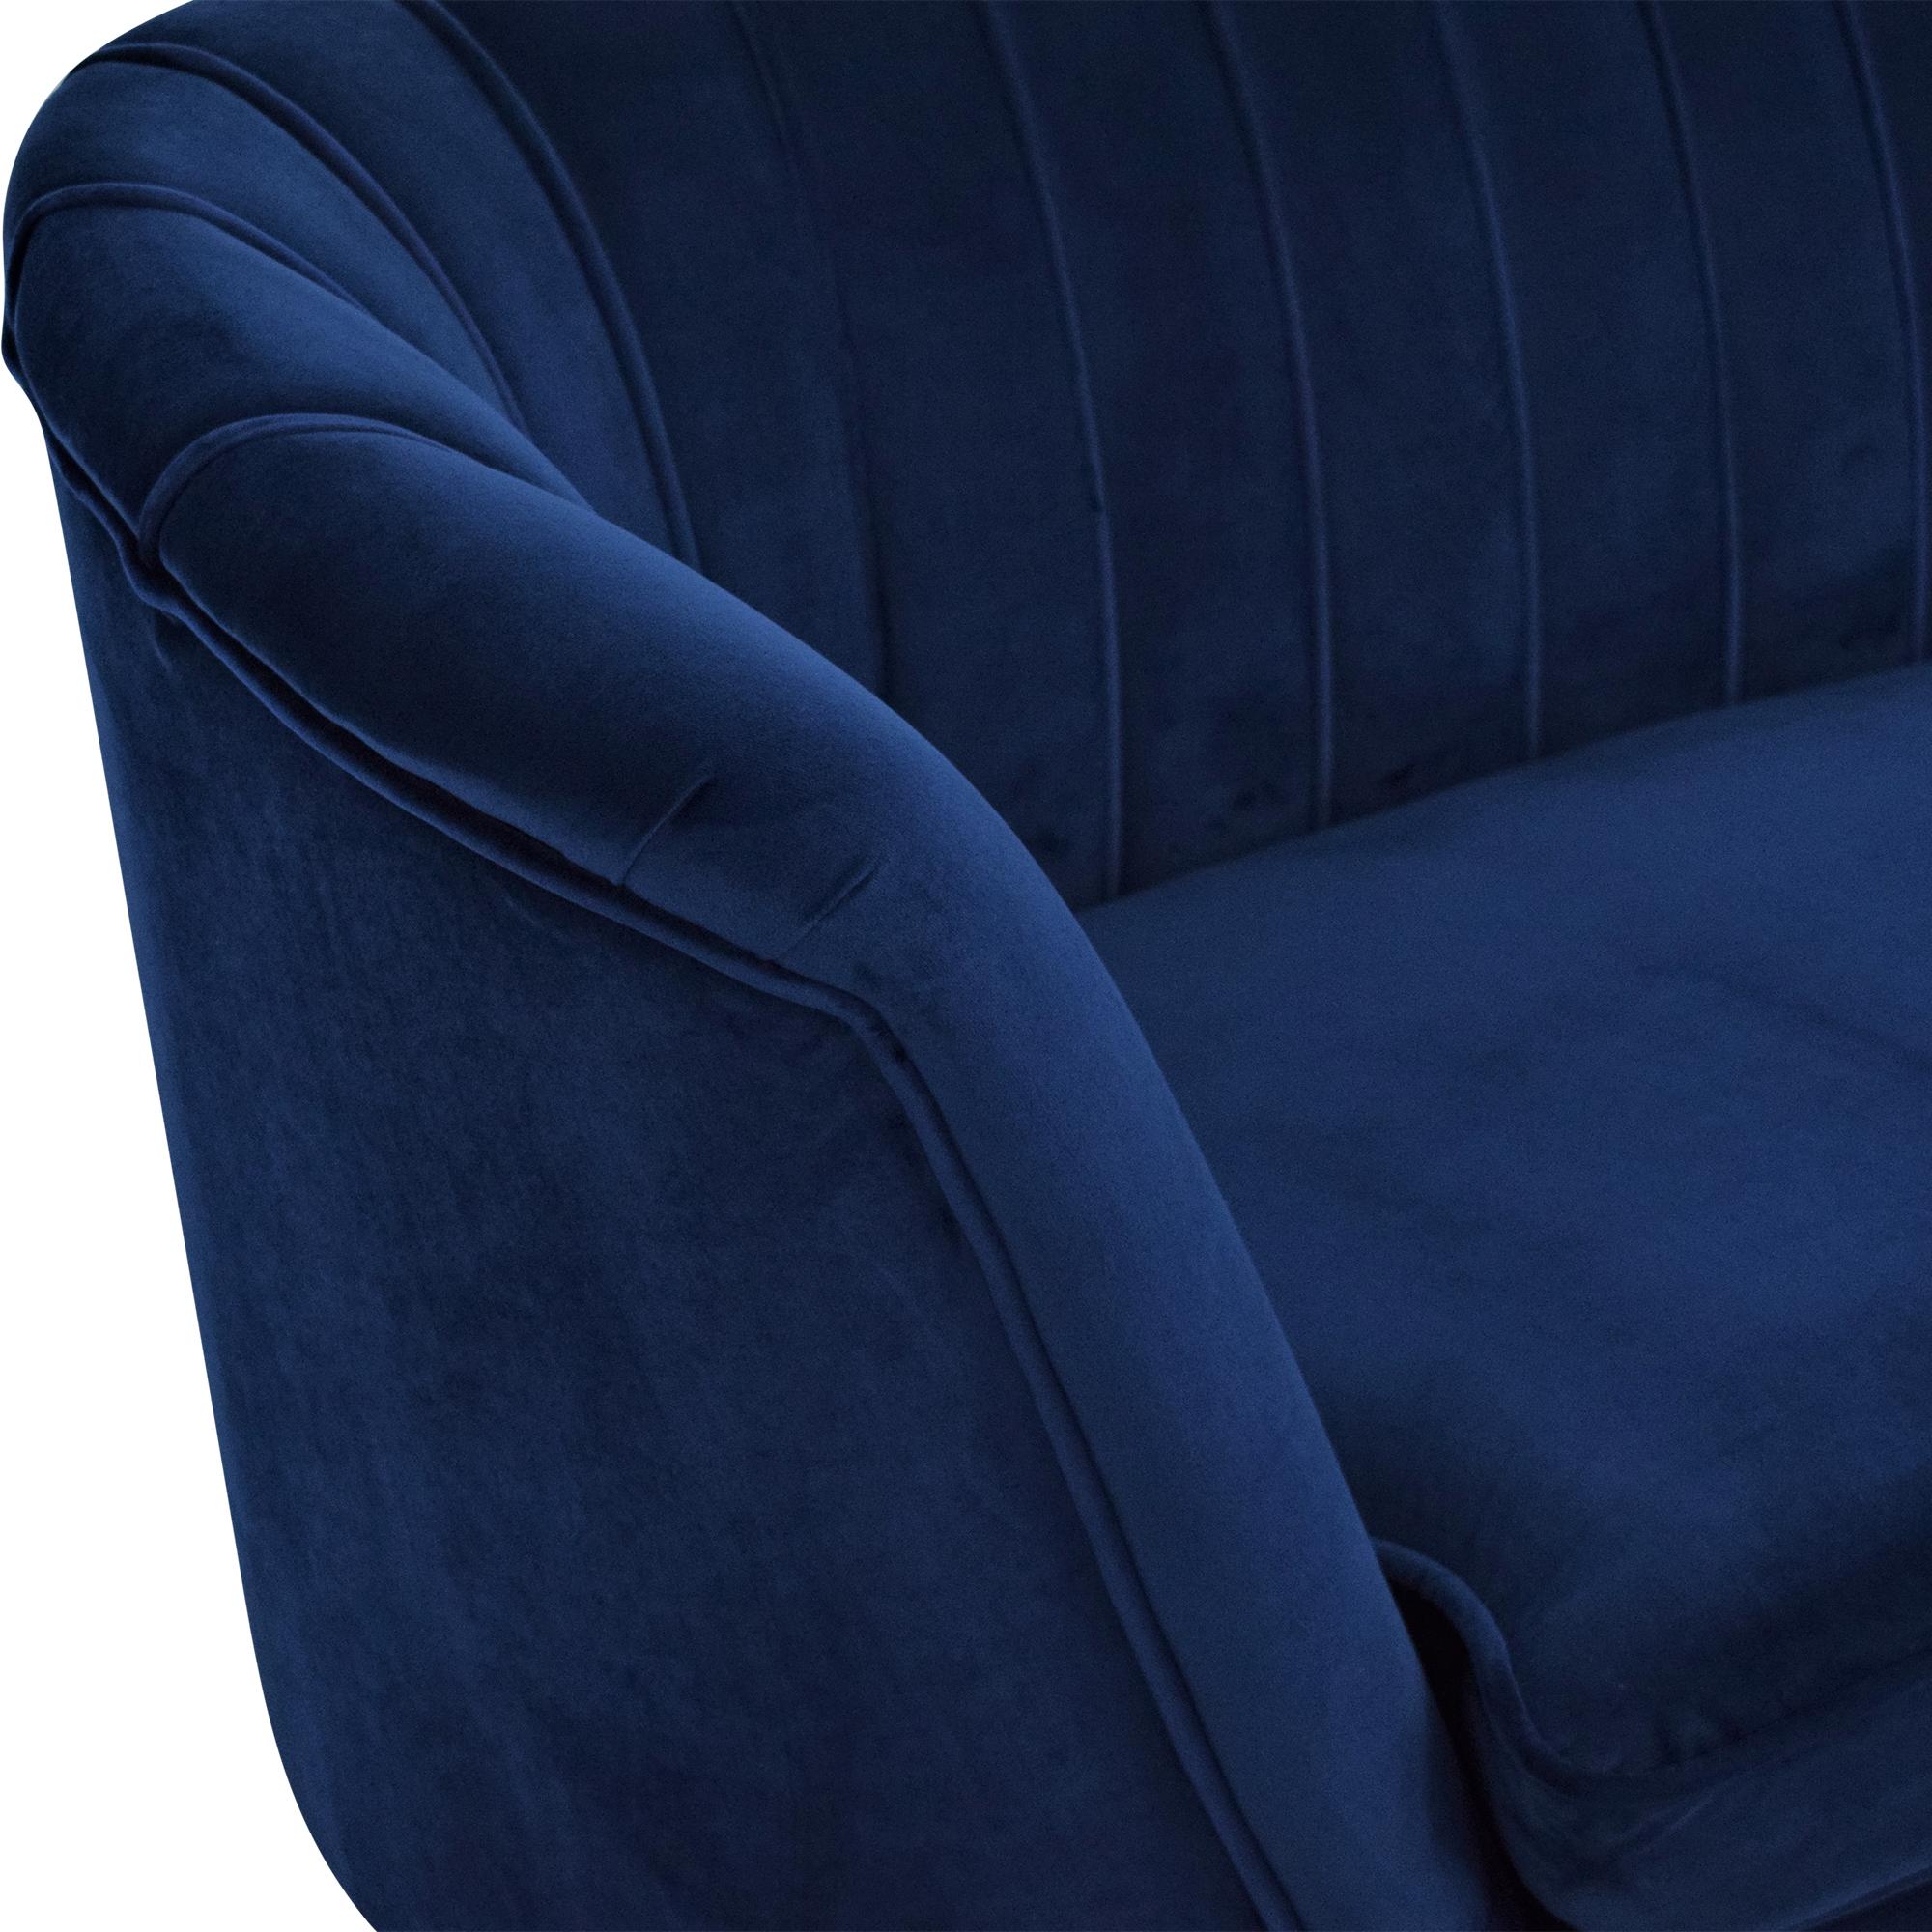 Wayfair Koger Chesterfield Round Sofa / Classic Sofas